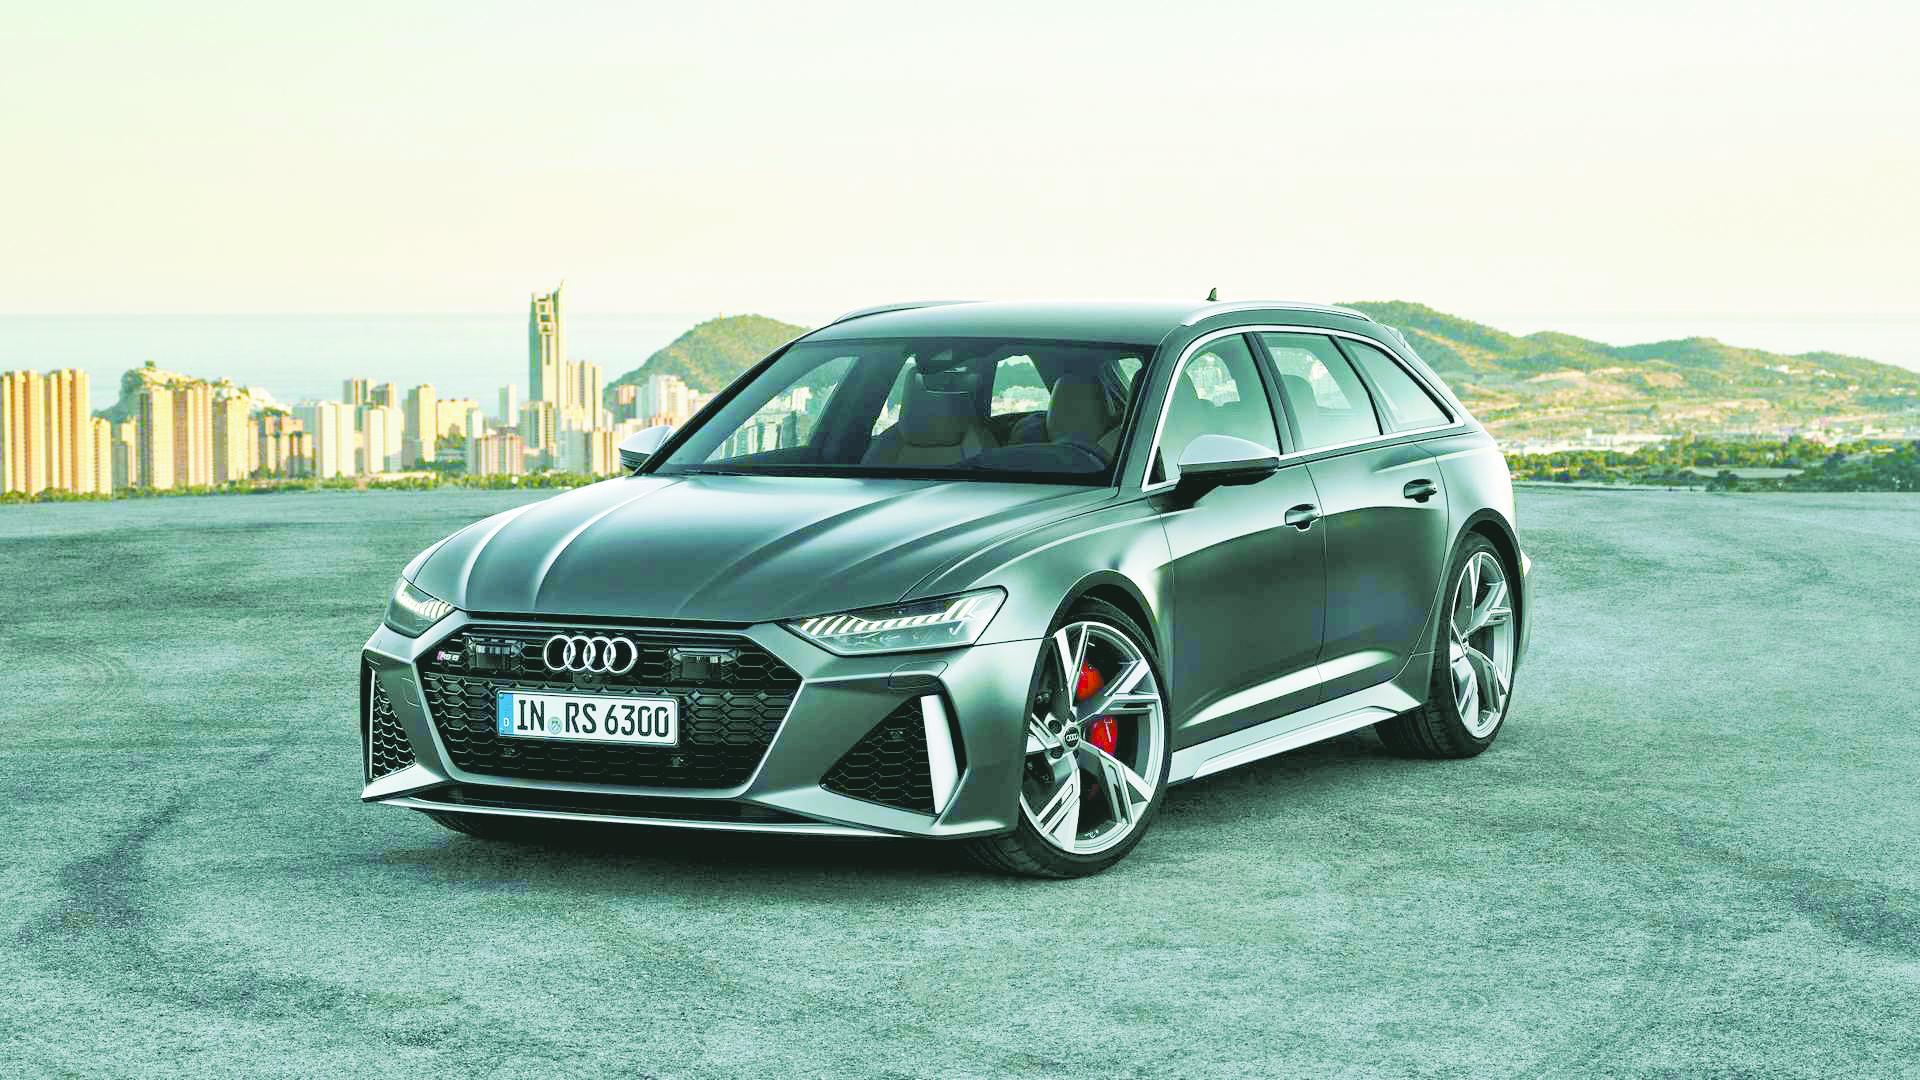 18 - Audi RS6 Avant